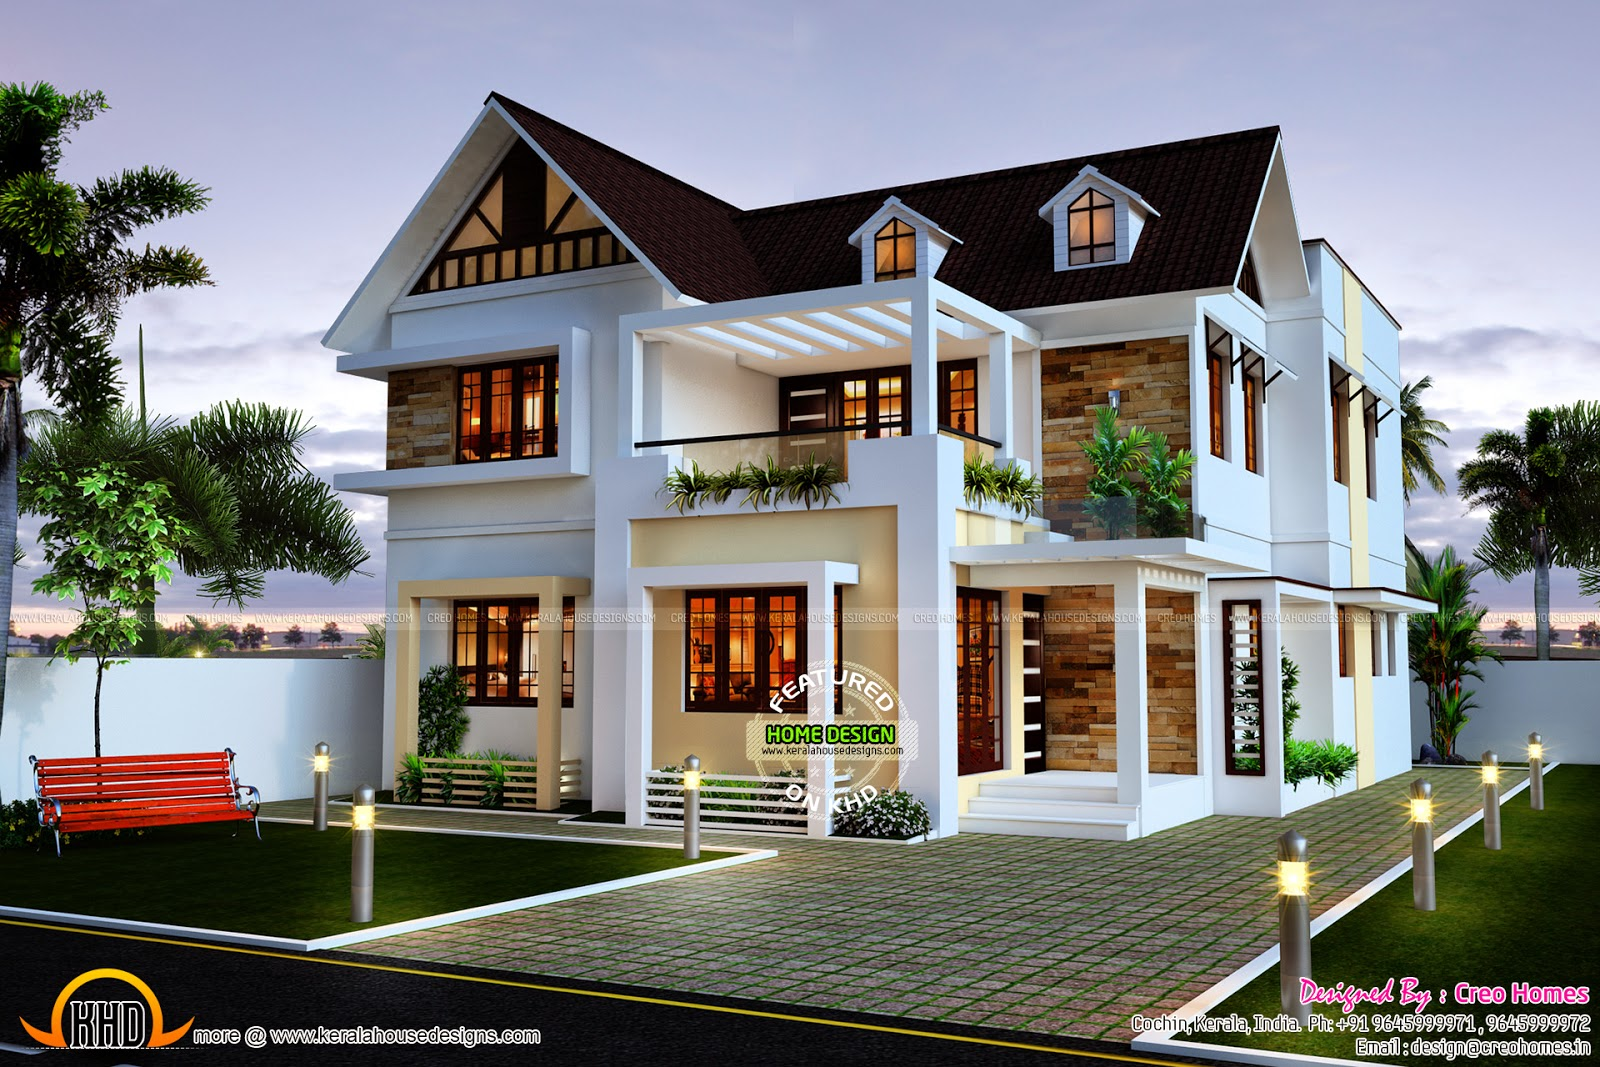 Very beautiful 4 bedroom home